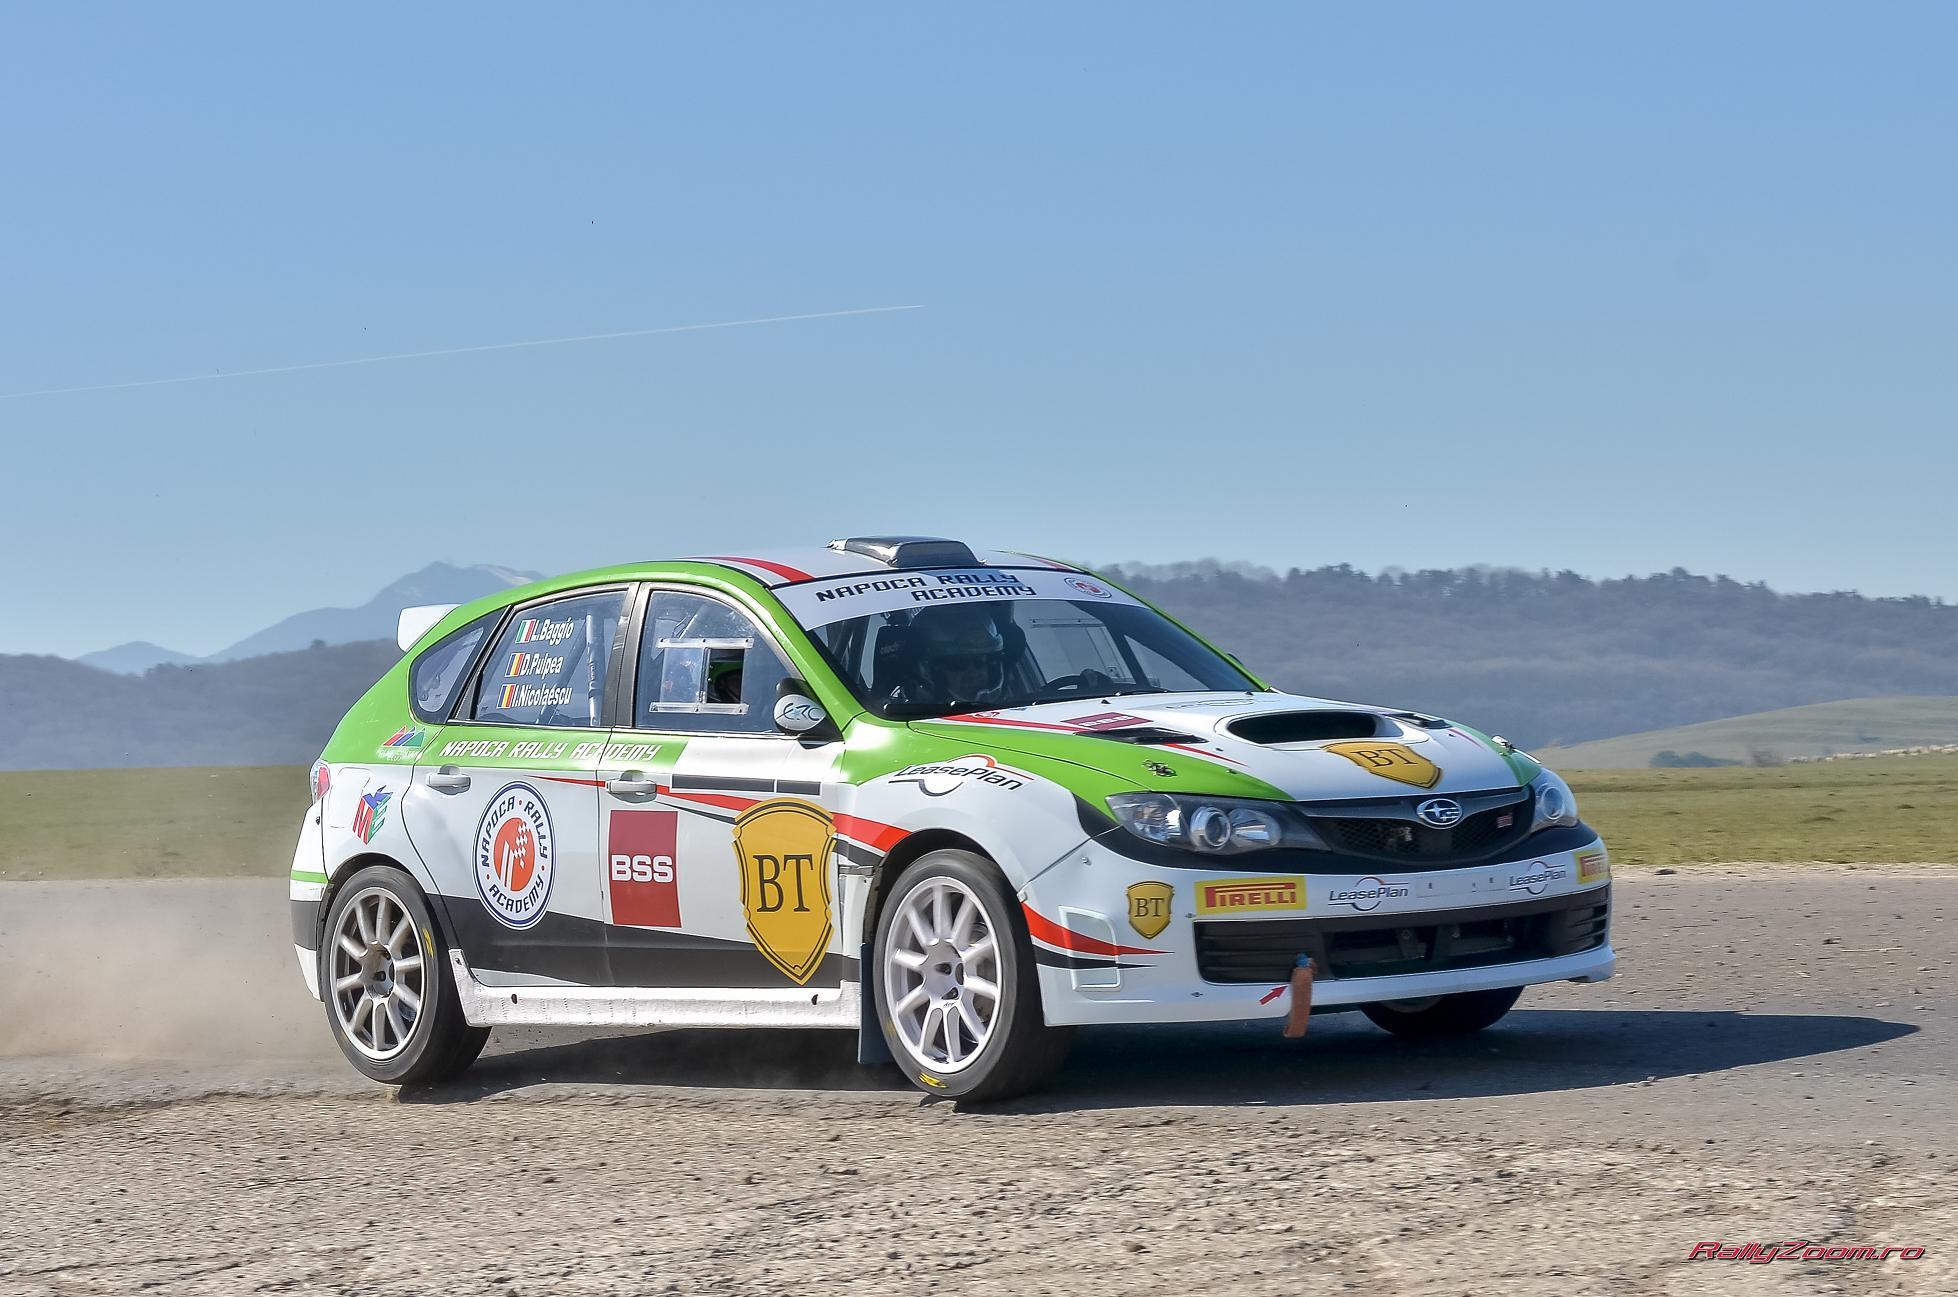 Marele Premiu al Orasului Brasov: echipa Napoca Rally Academy la start